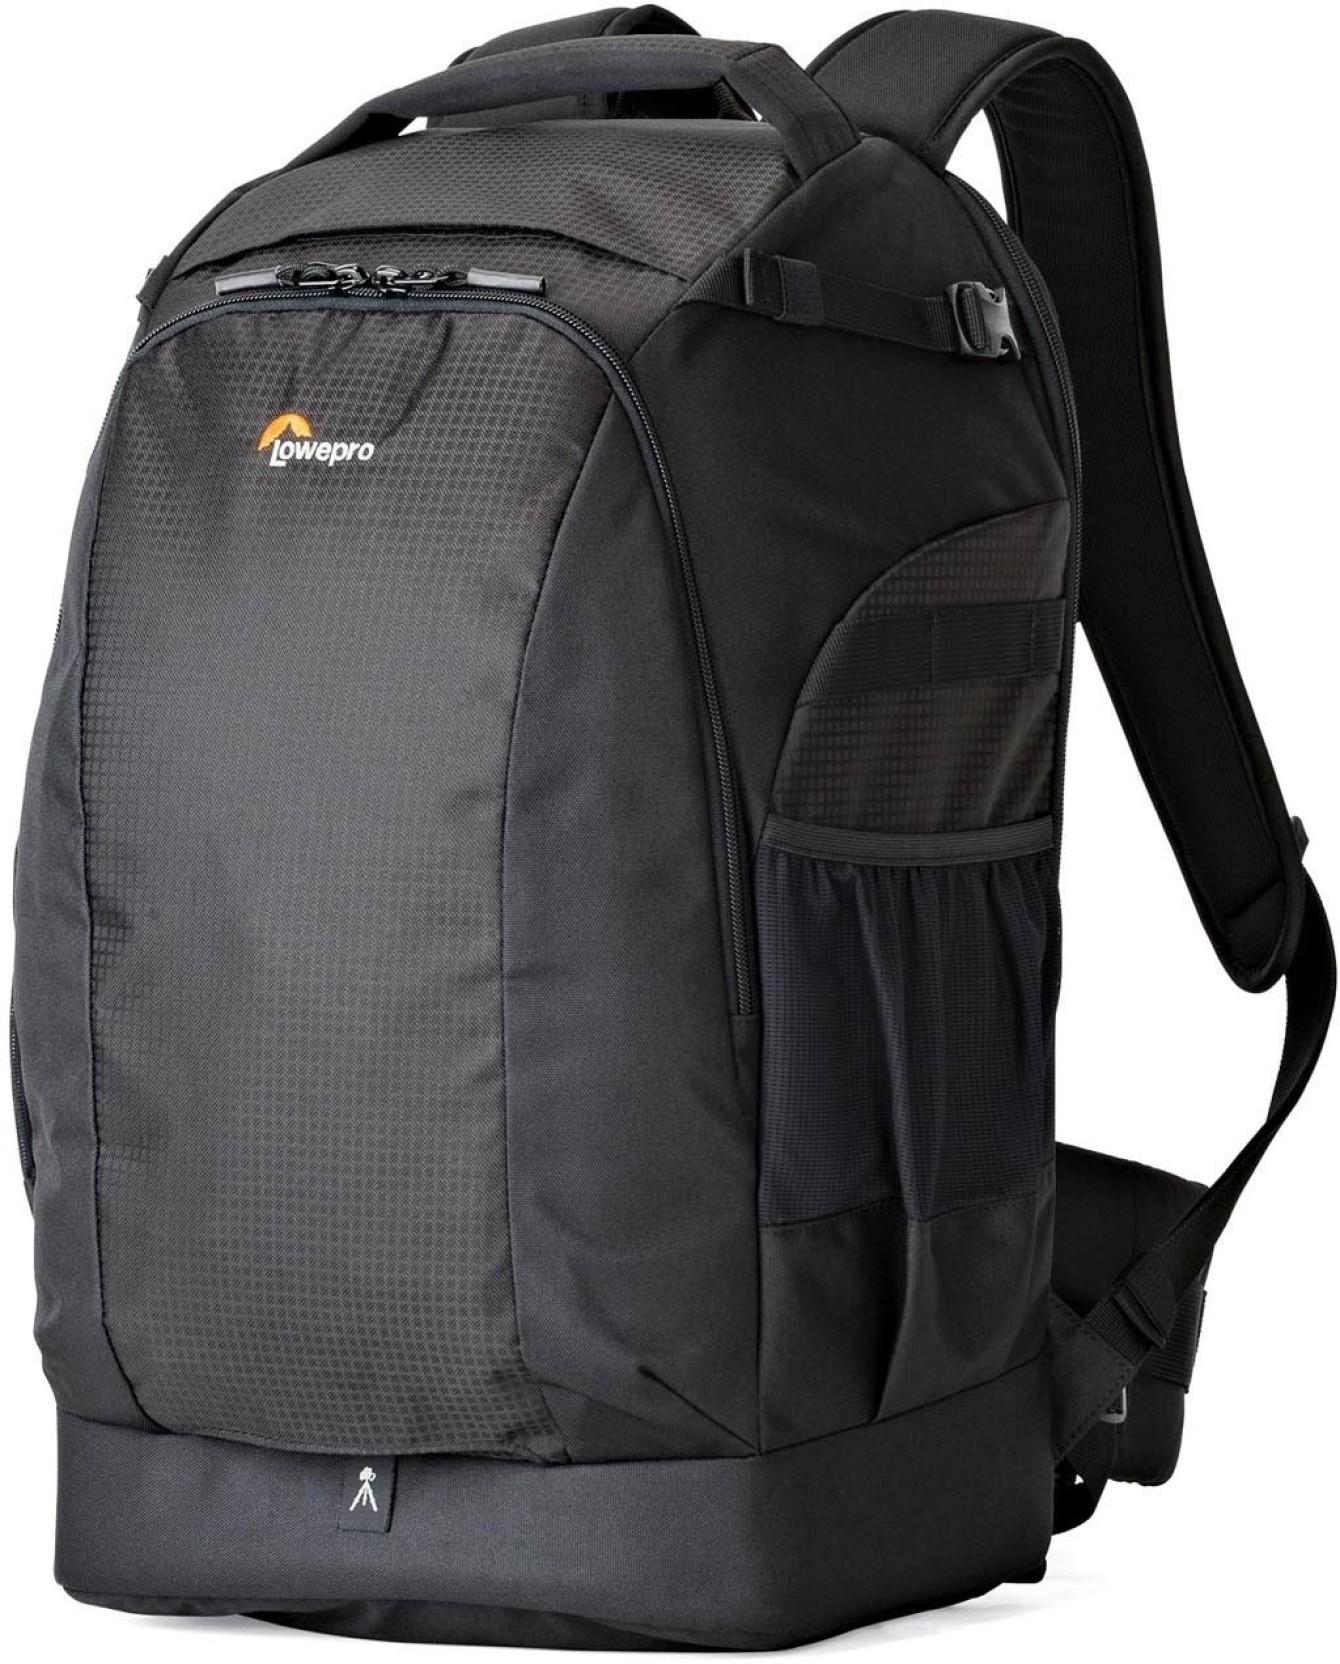 Lowepro Flipside 500 Aw Ii Camera Bag 300 On Offer